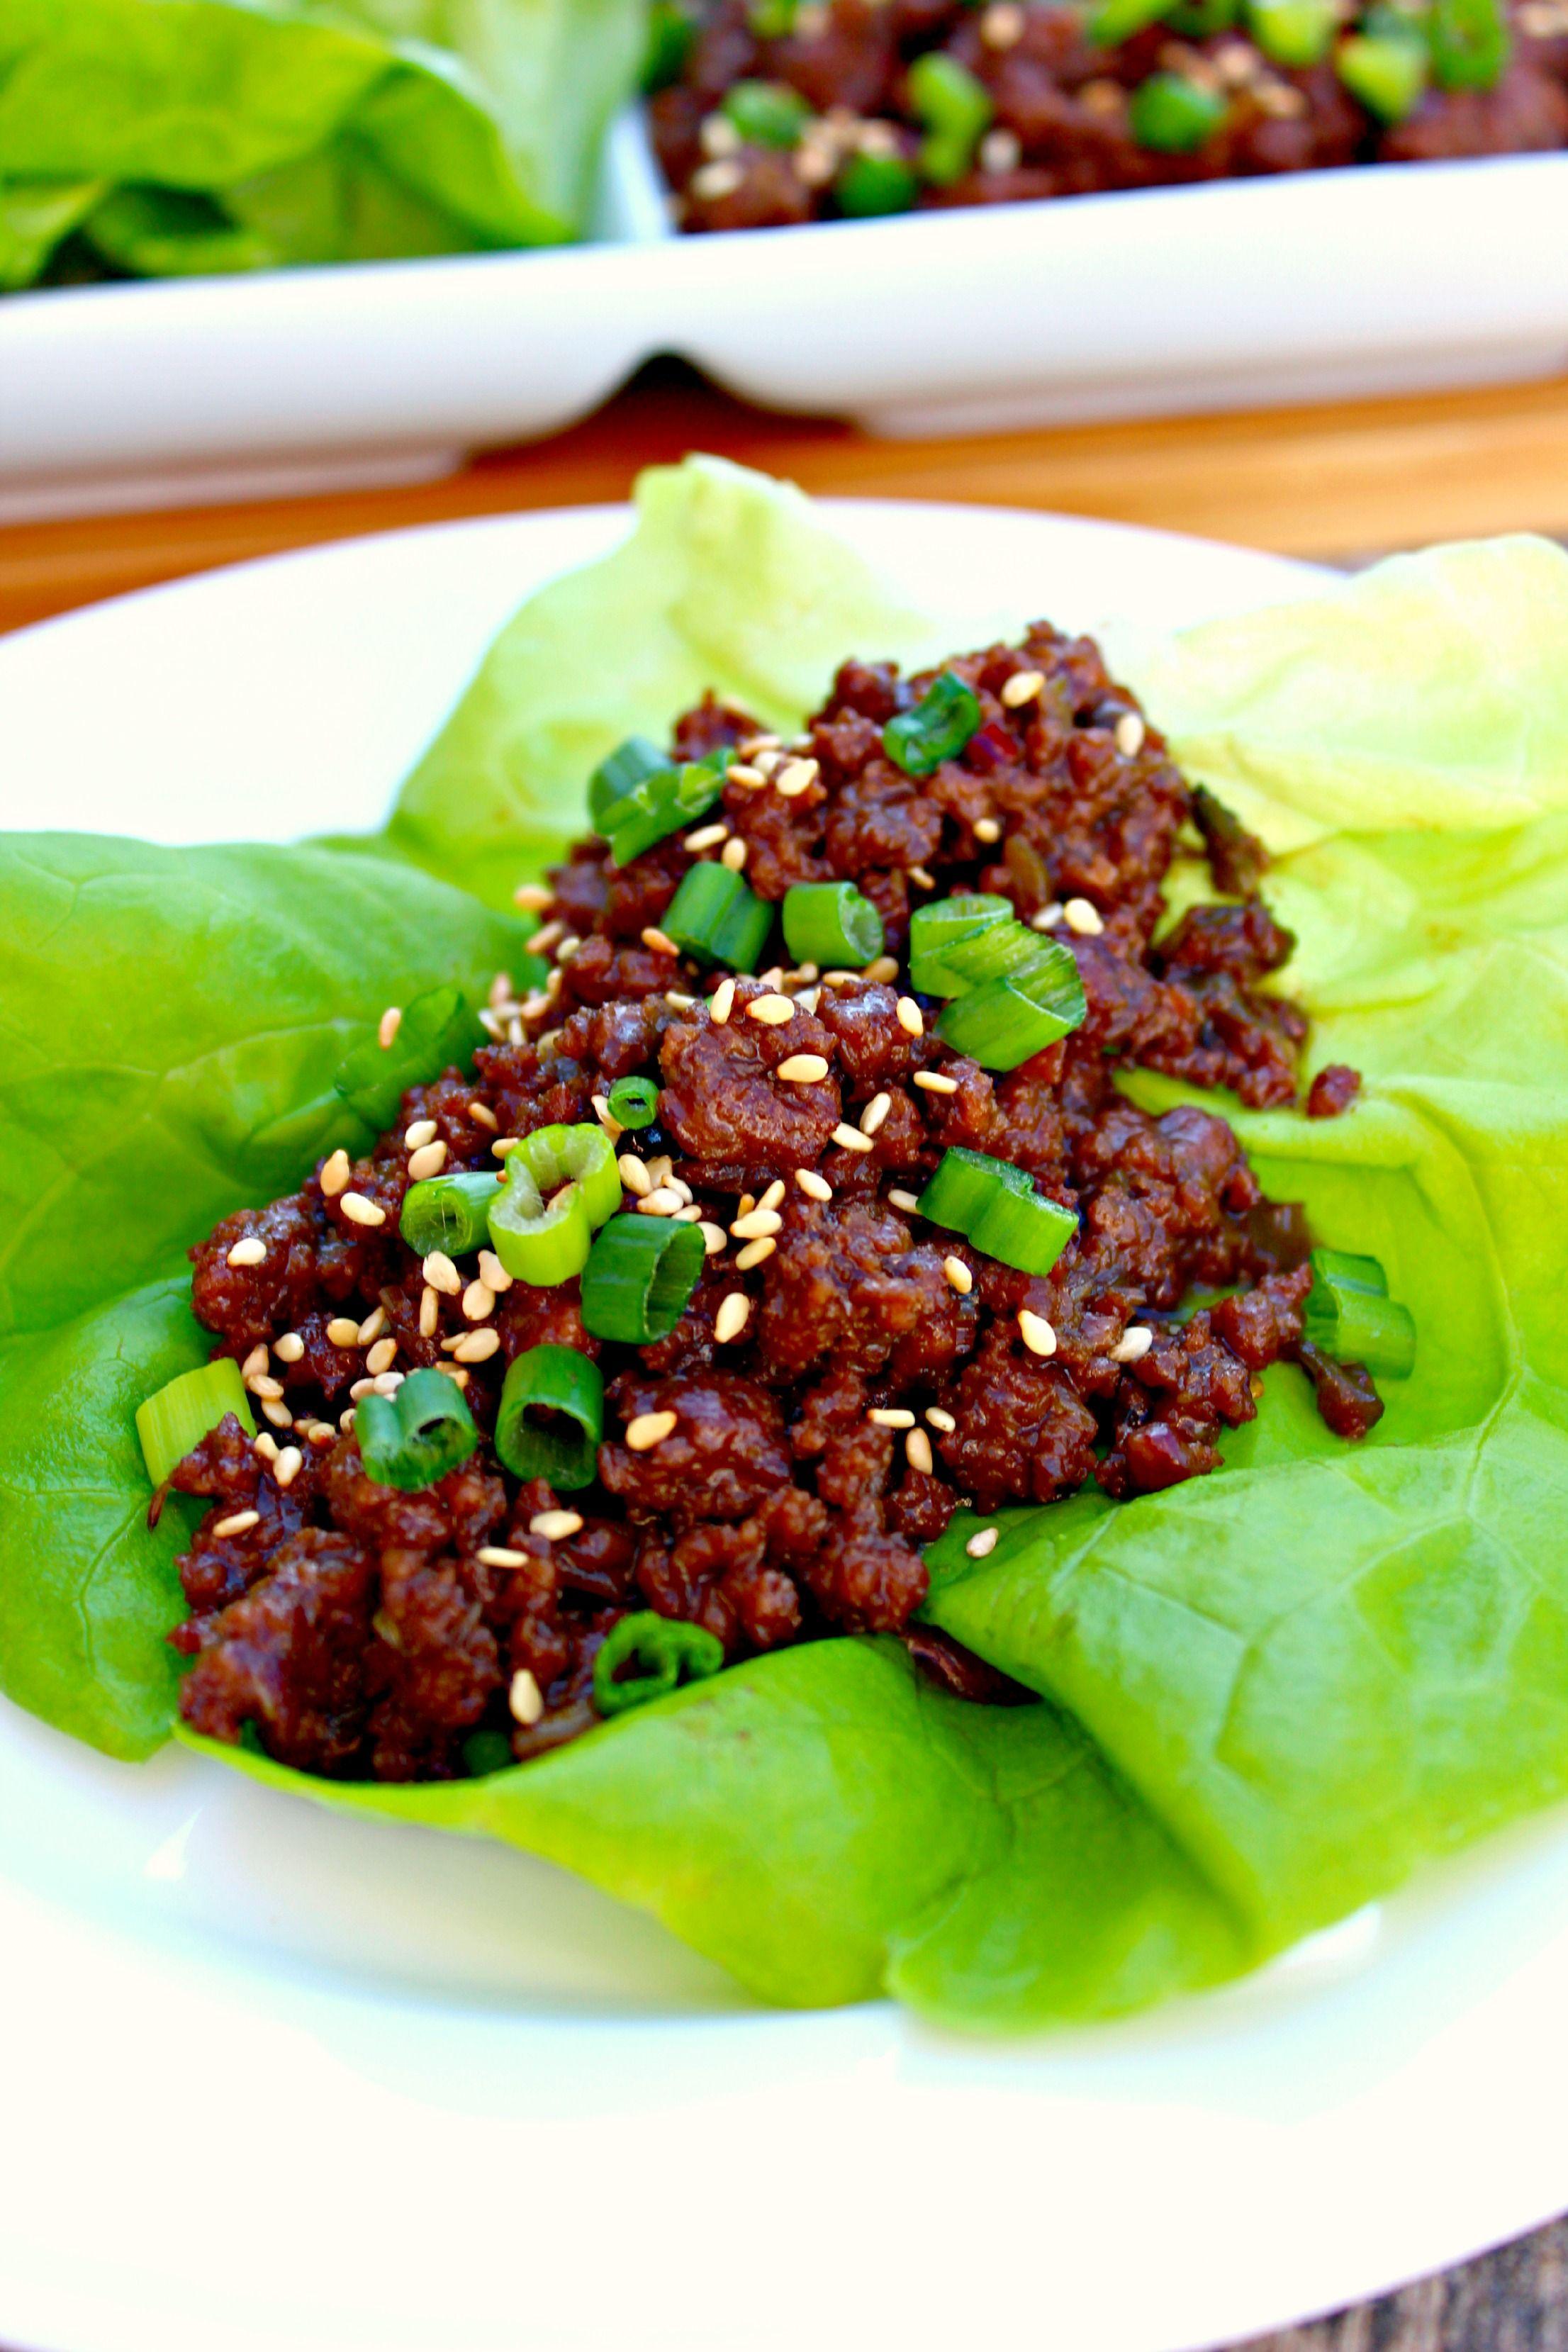 Korean Beef Lettuce Wrap - sugar, soy sauce, sesame oil, garlic, ginger, green onions, rice vinegar